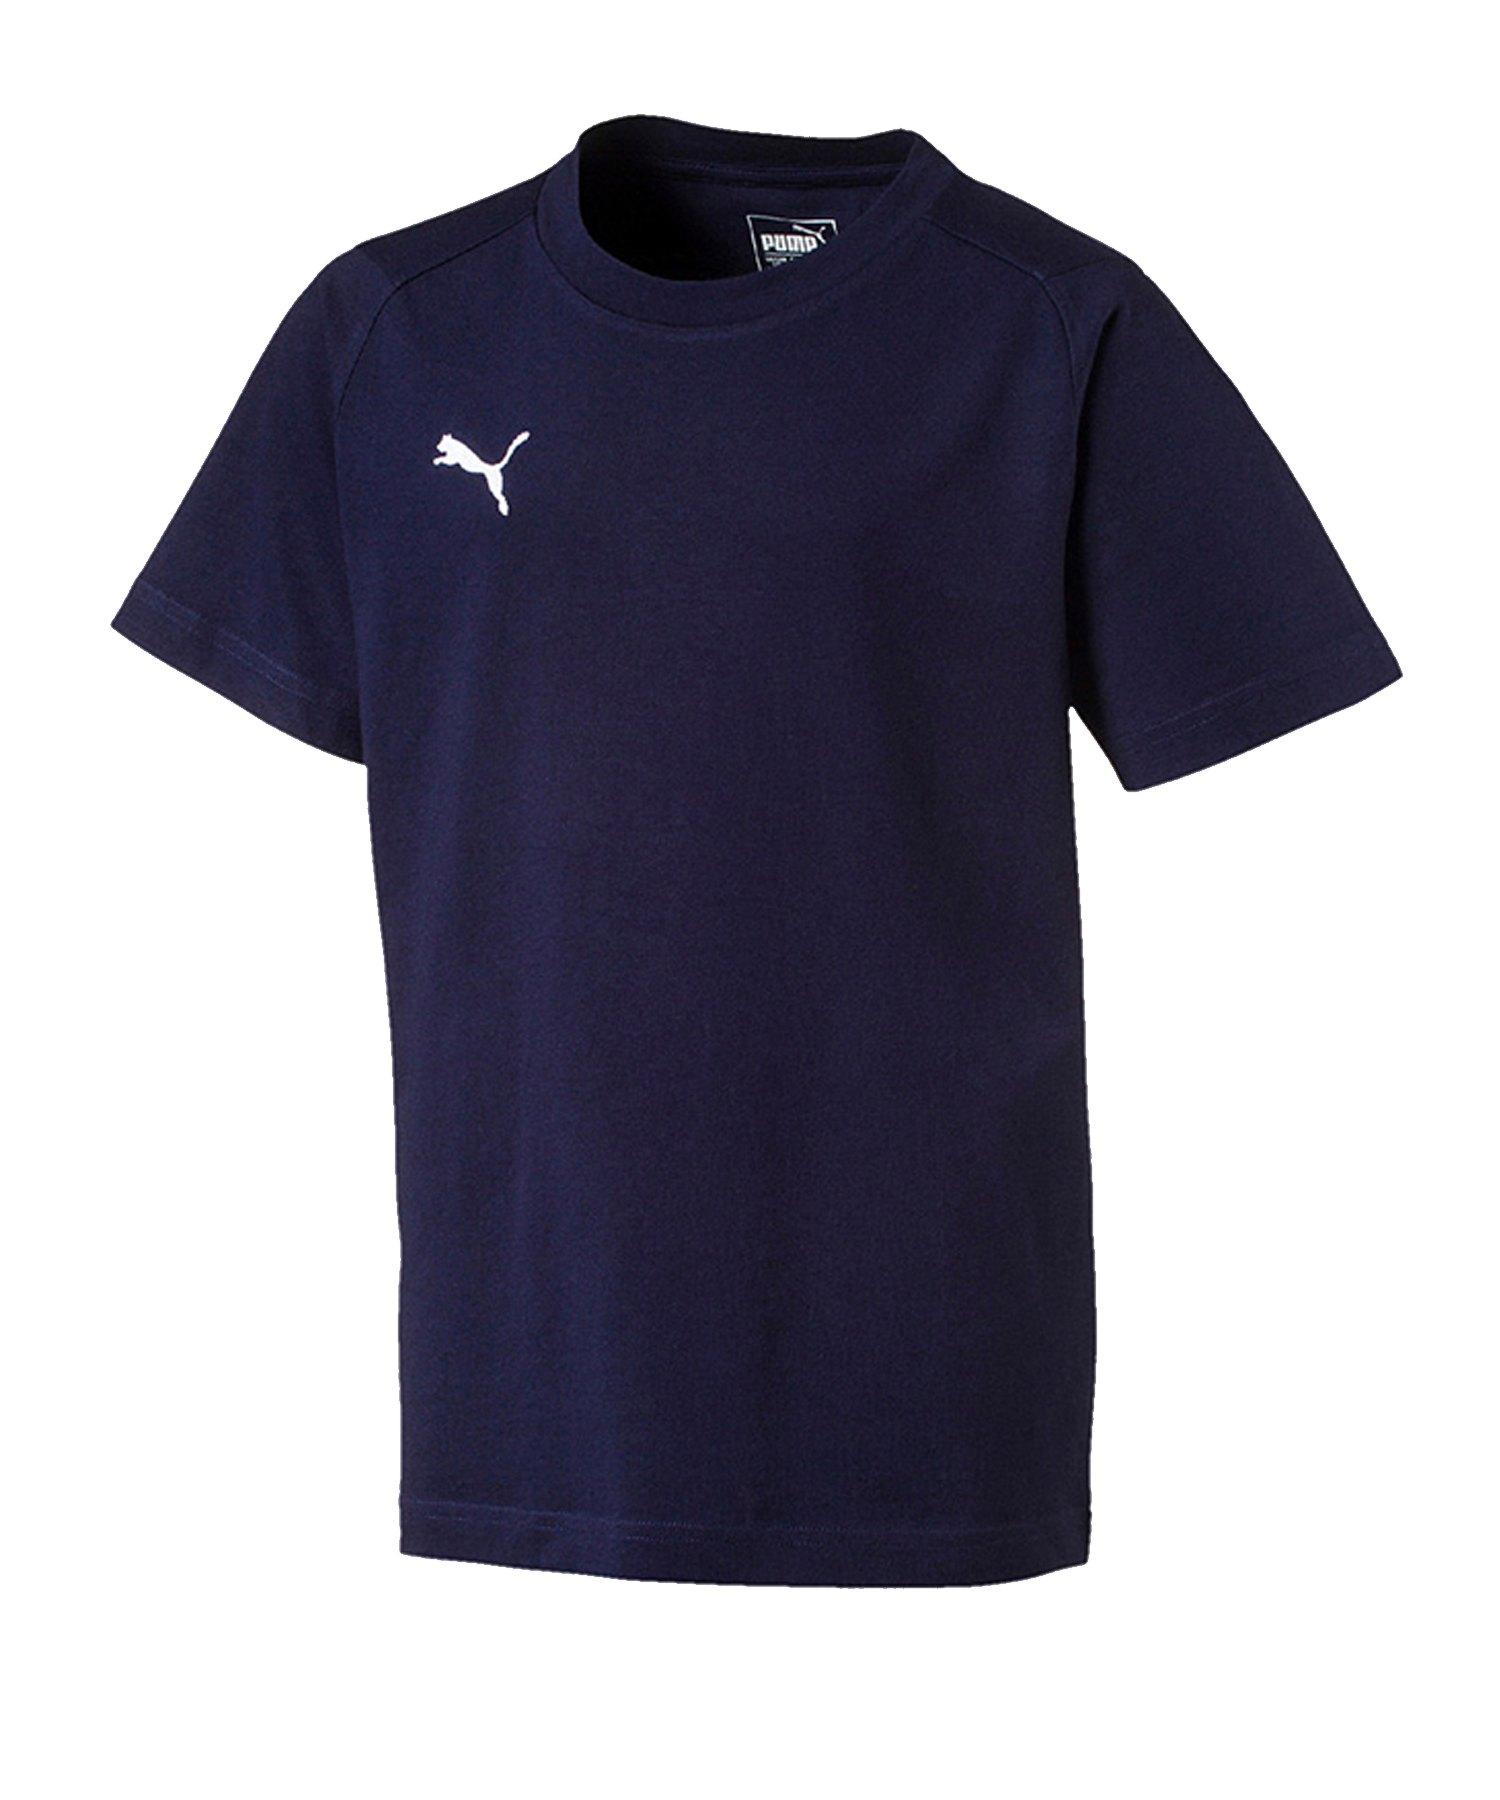 PUMA LIGA Casuals T-Shirt Kids Blau Weiss F06 - blau